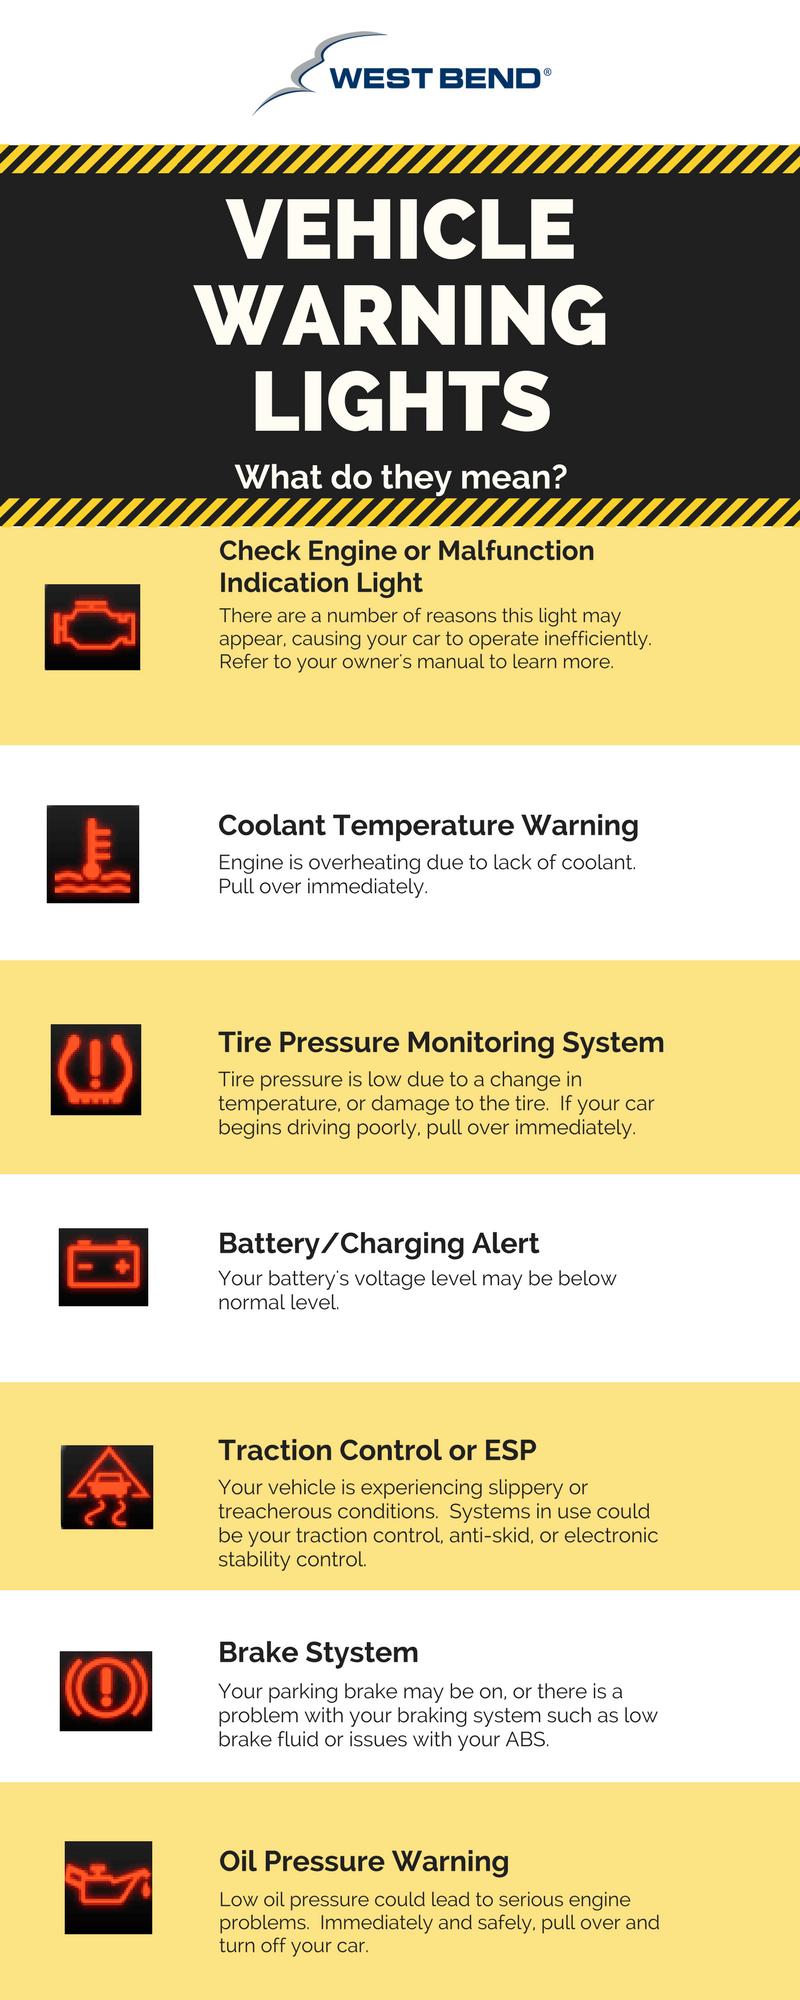 Vehicle Warning Lights (1).png